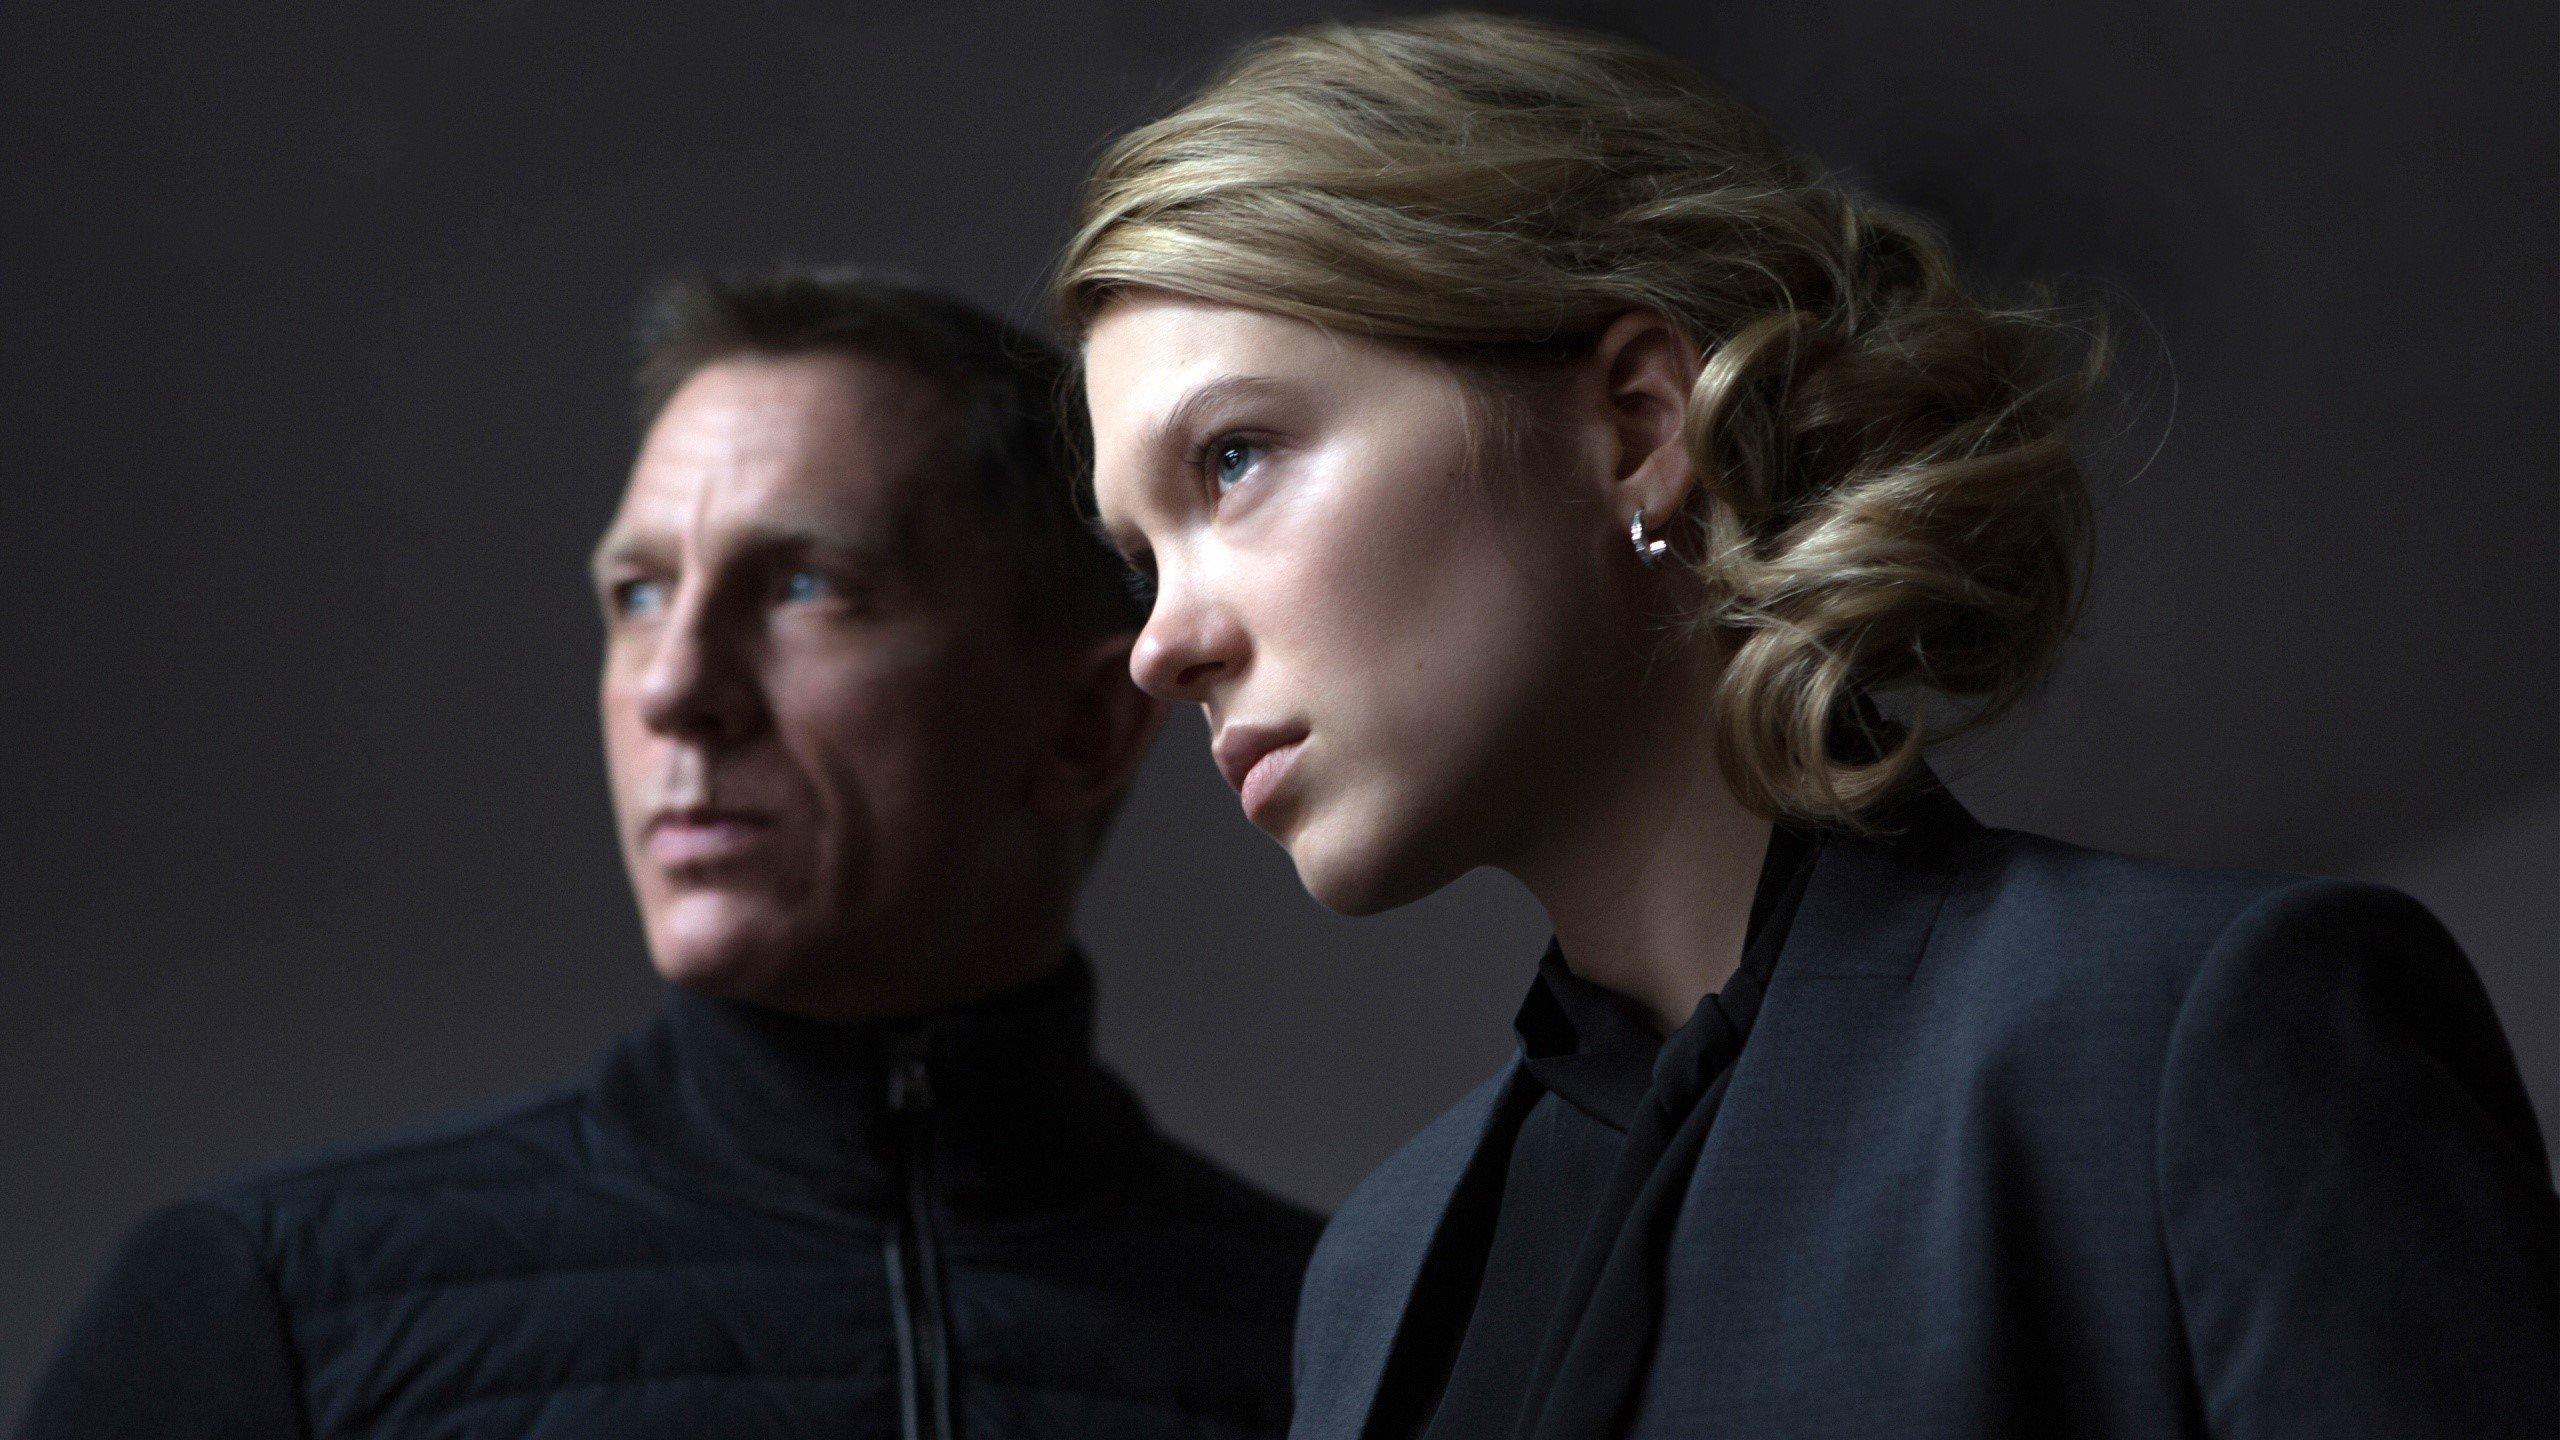 Fondos de pantalla James Bond y Madeleine Swann en Spectre